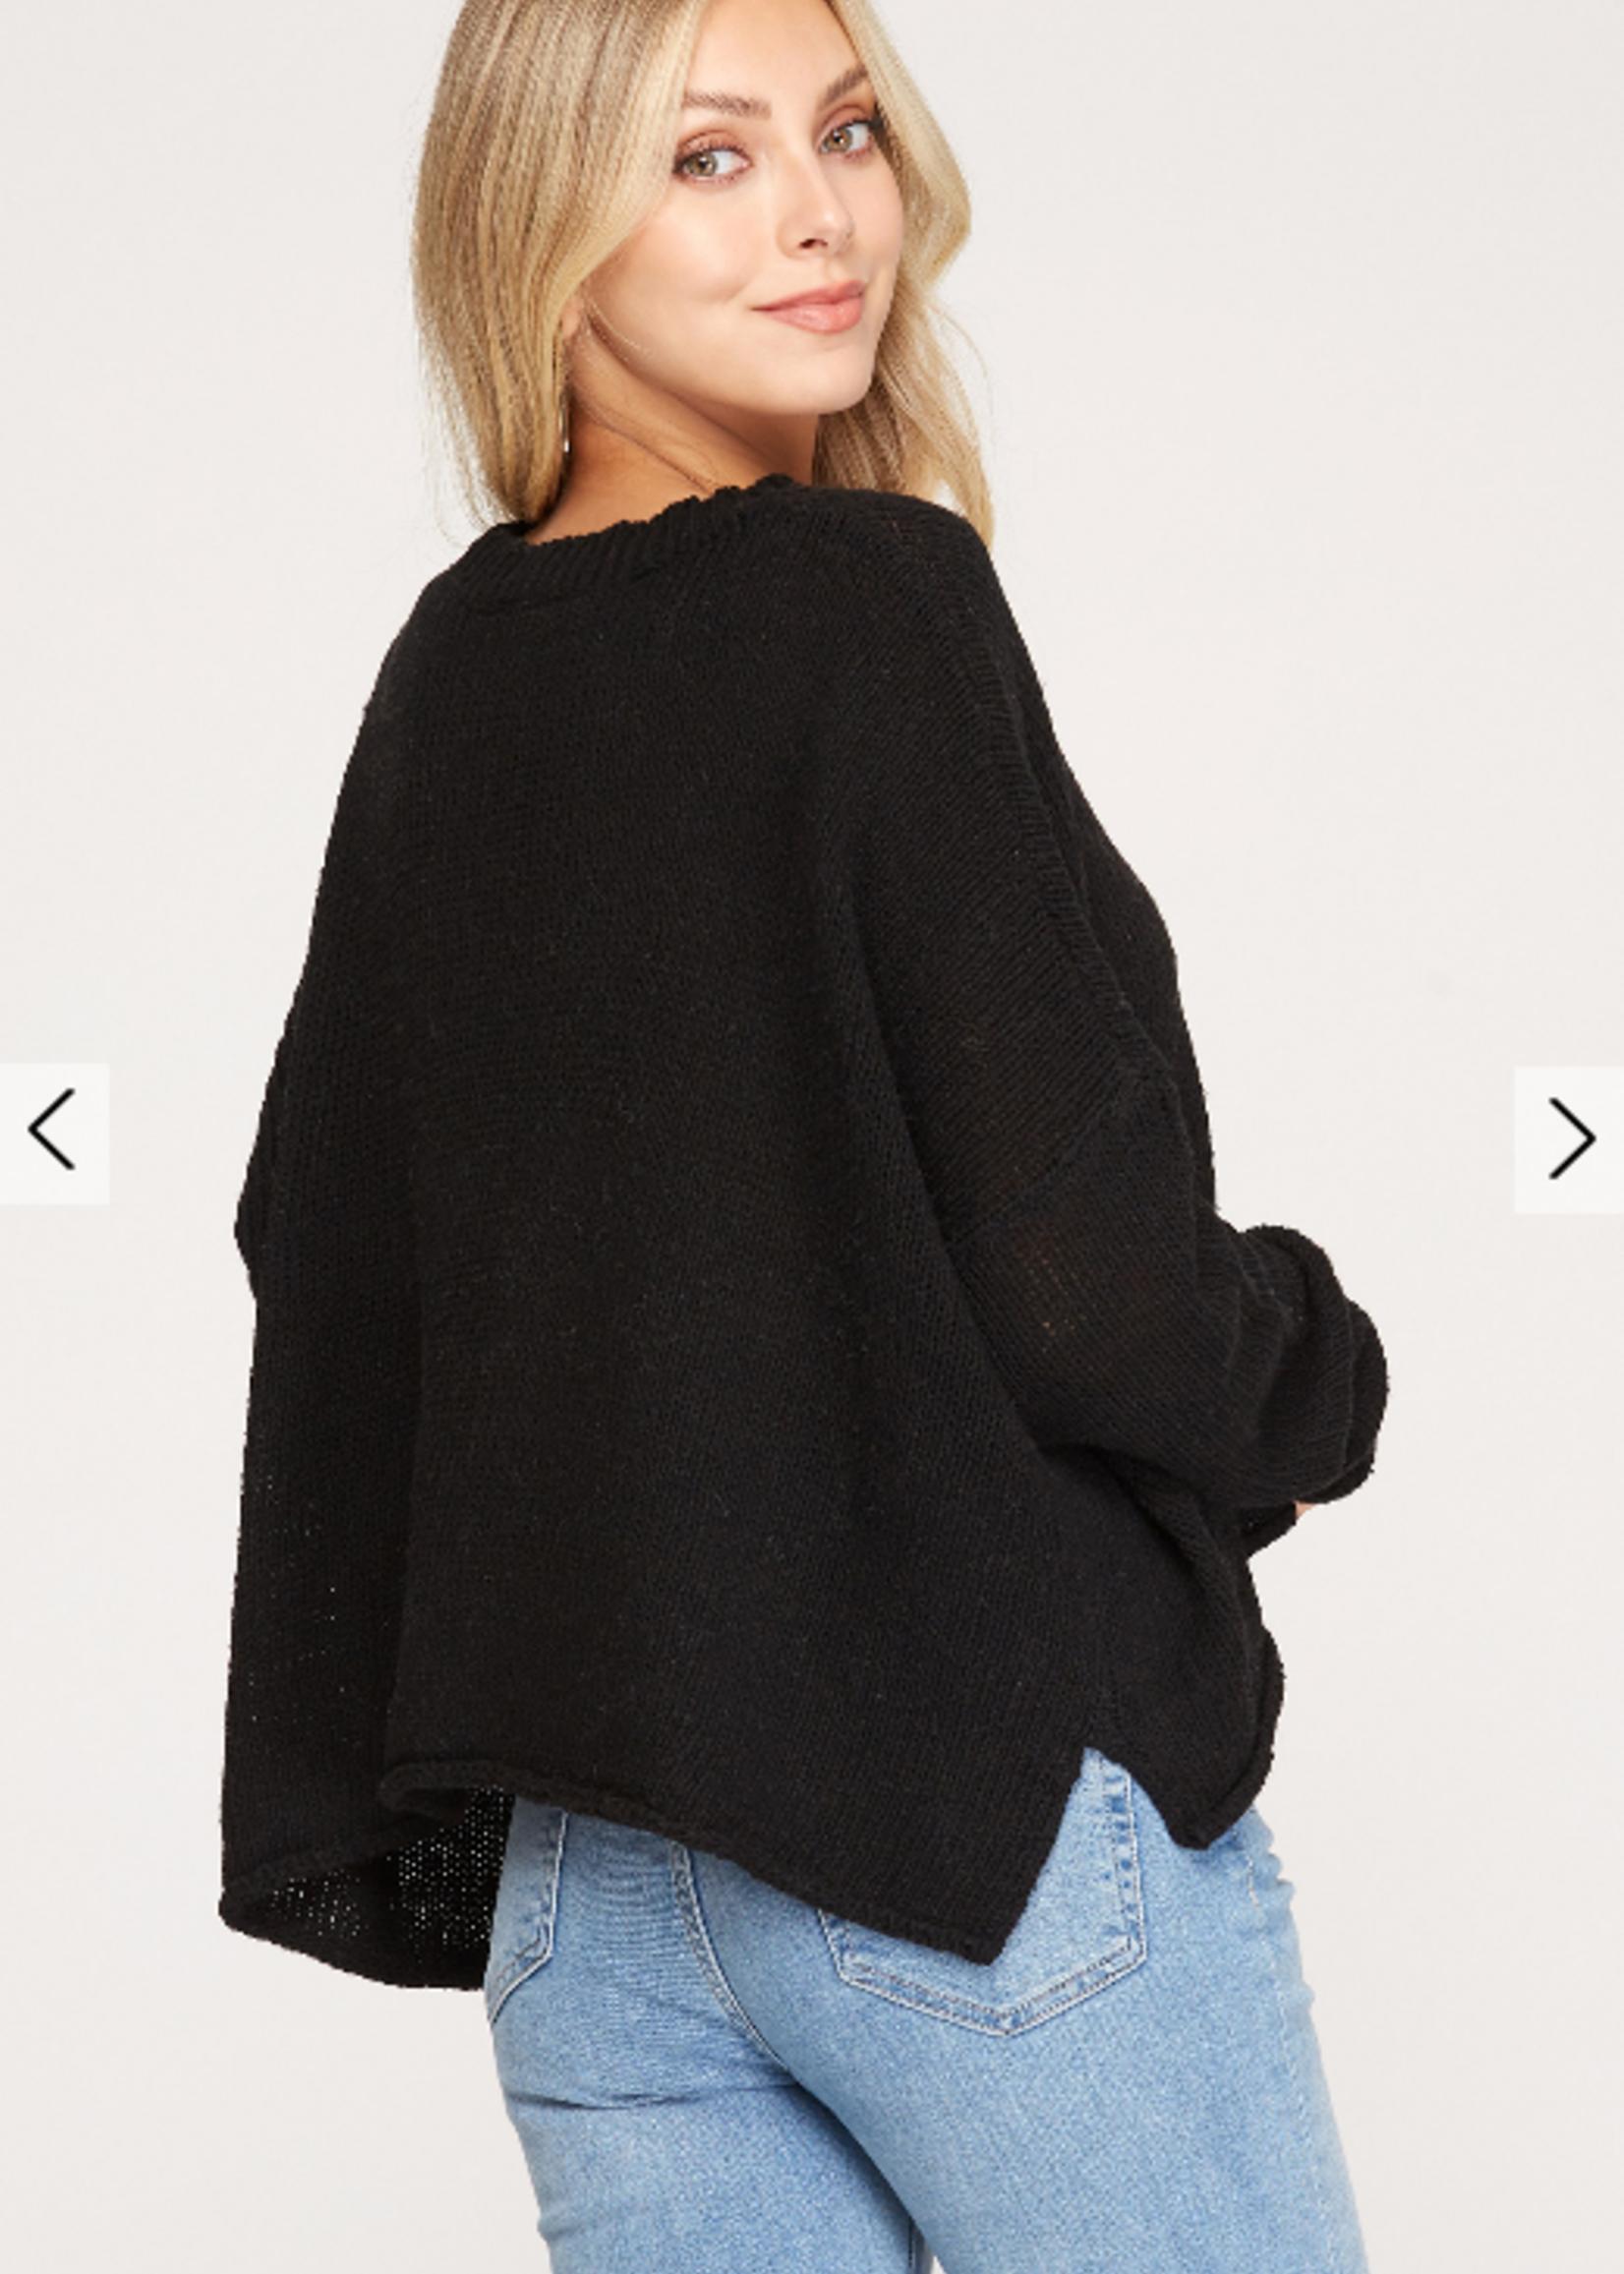 Crop Knit Sweater - Black